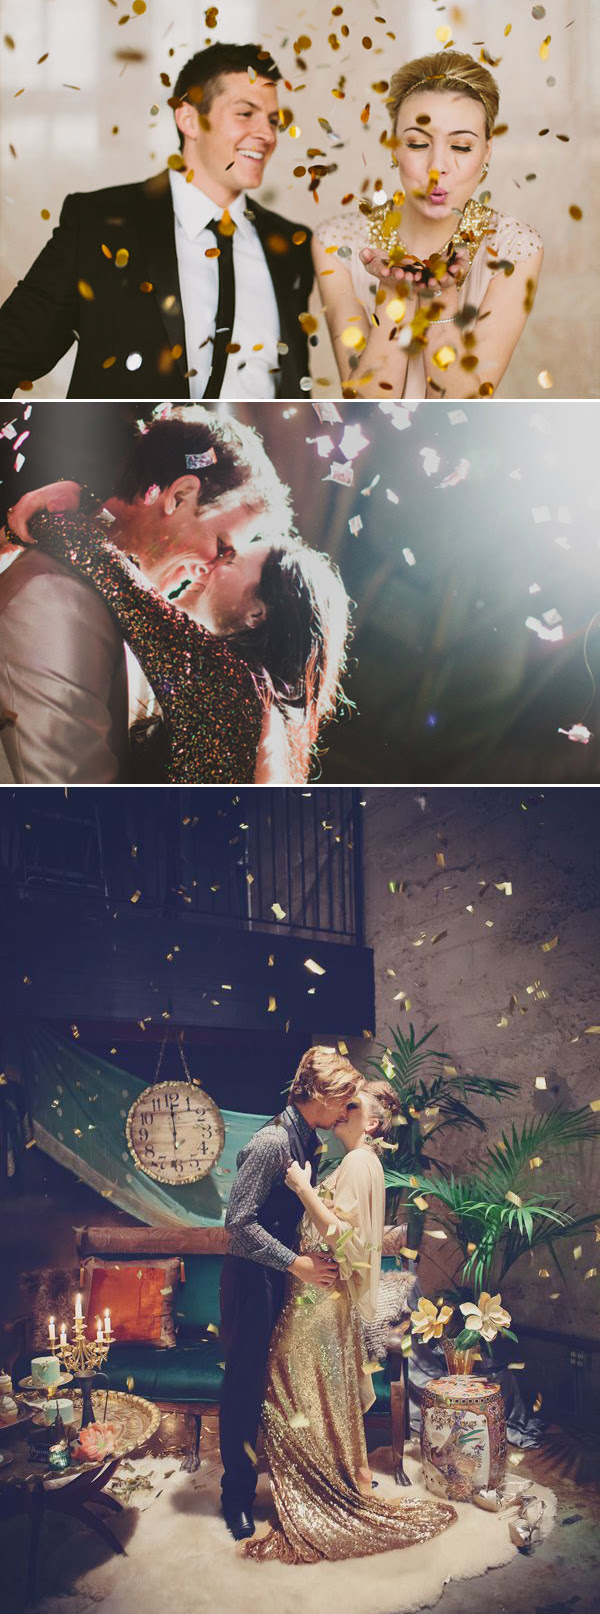 21 Cute New Years Eve Couple Photo Ideas Praise Wedding